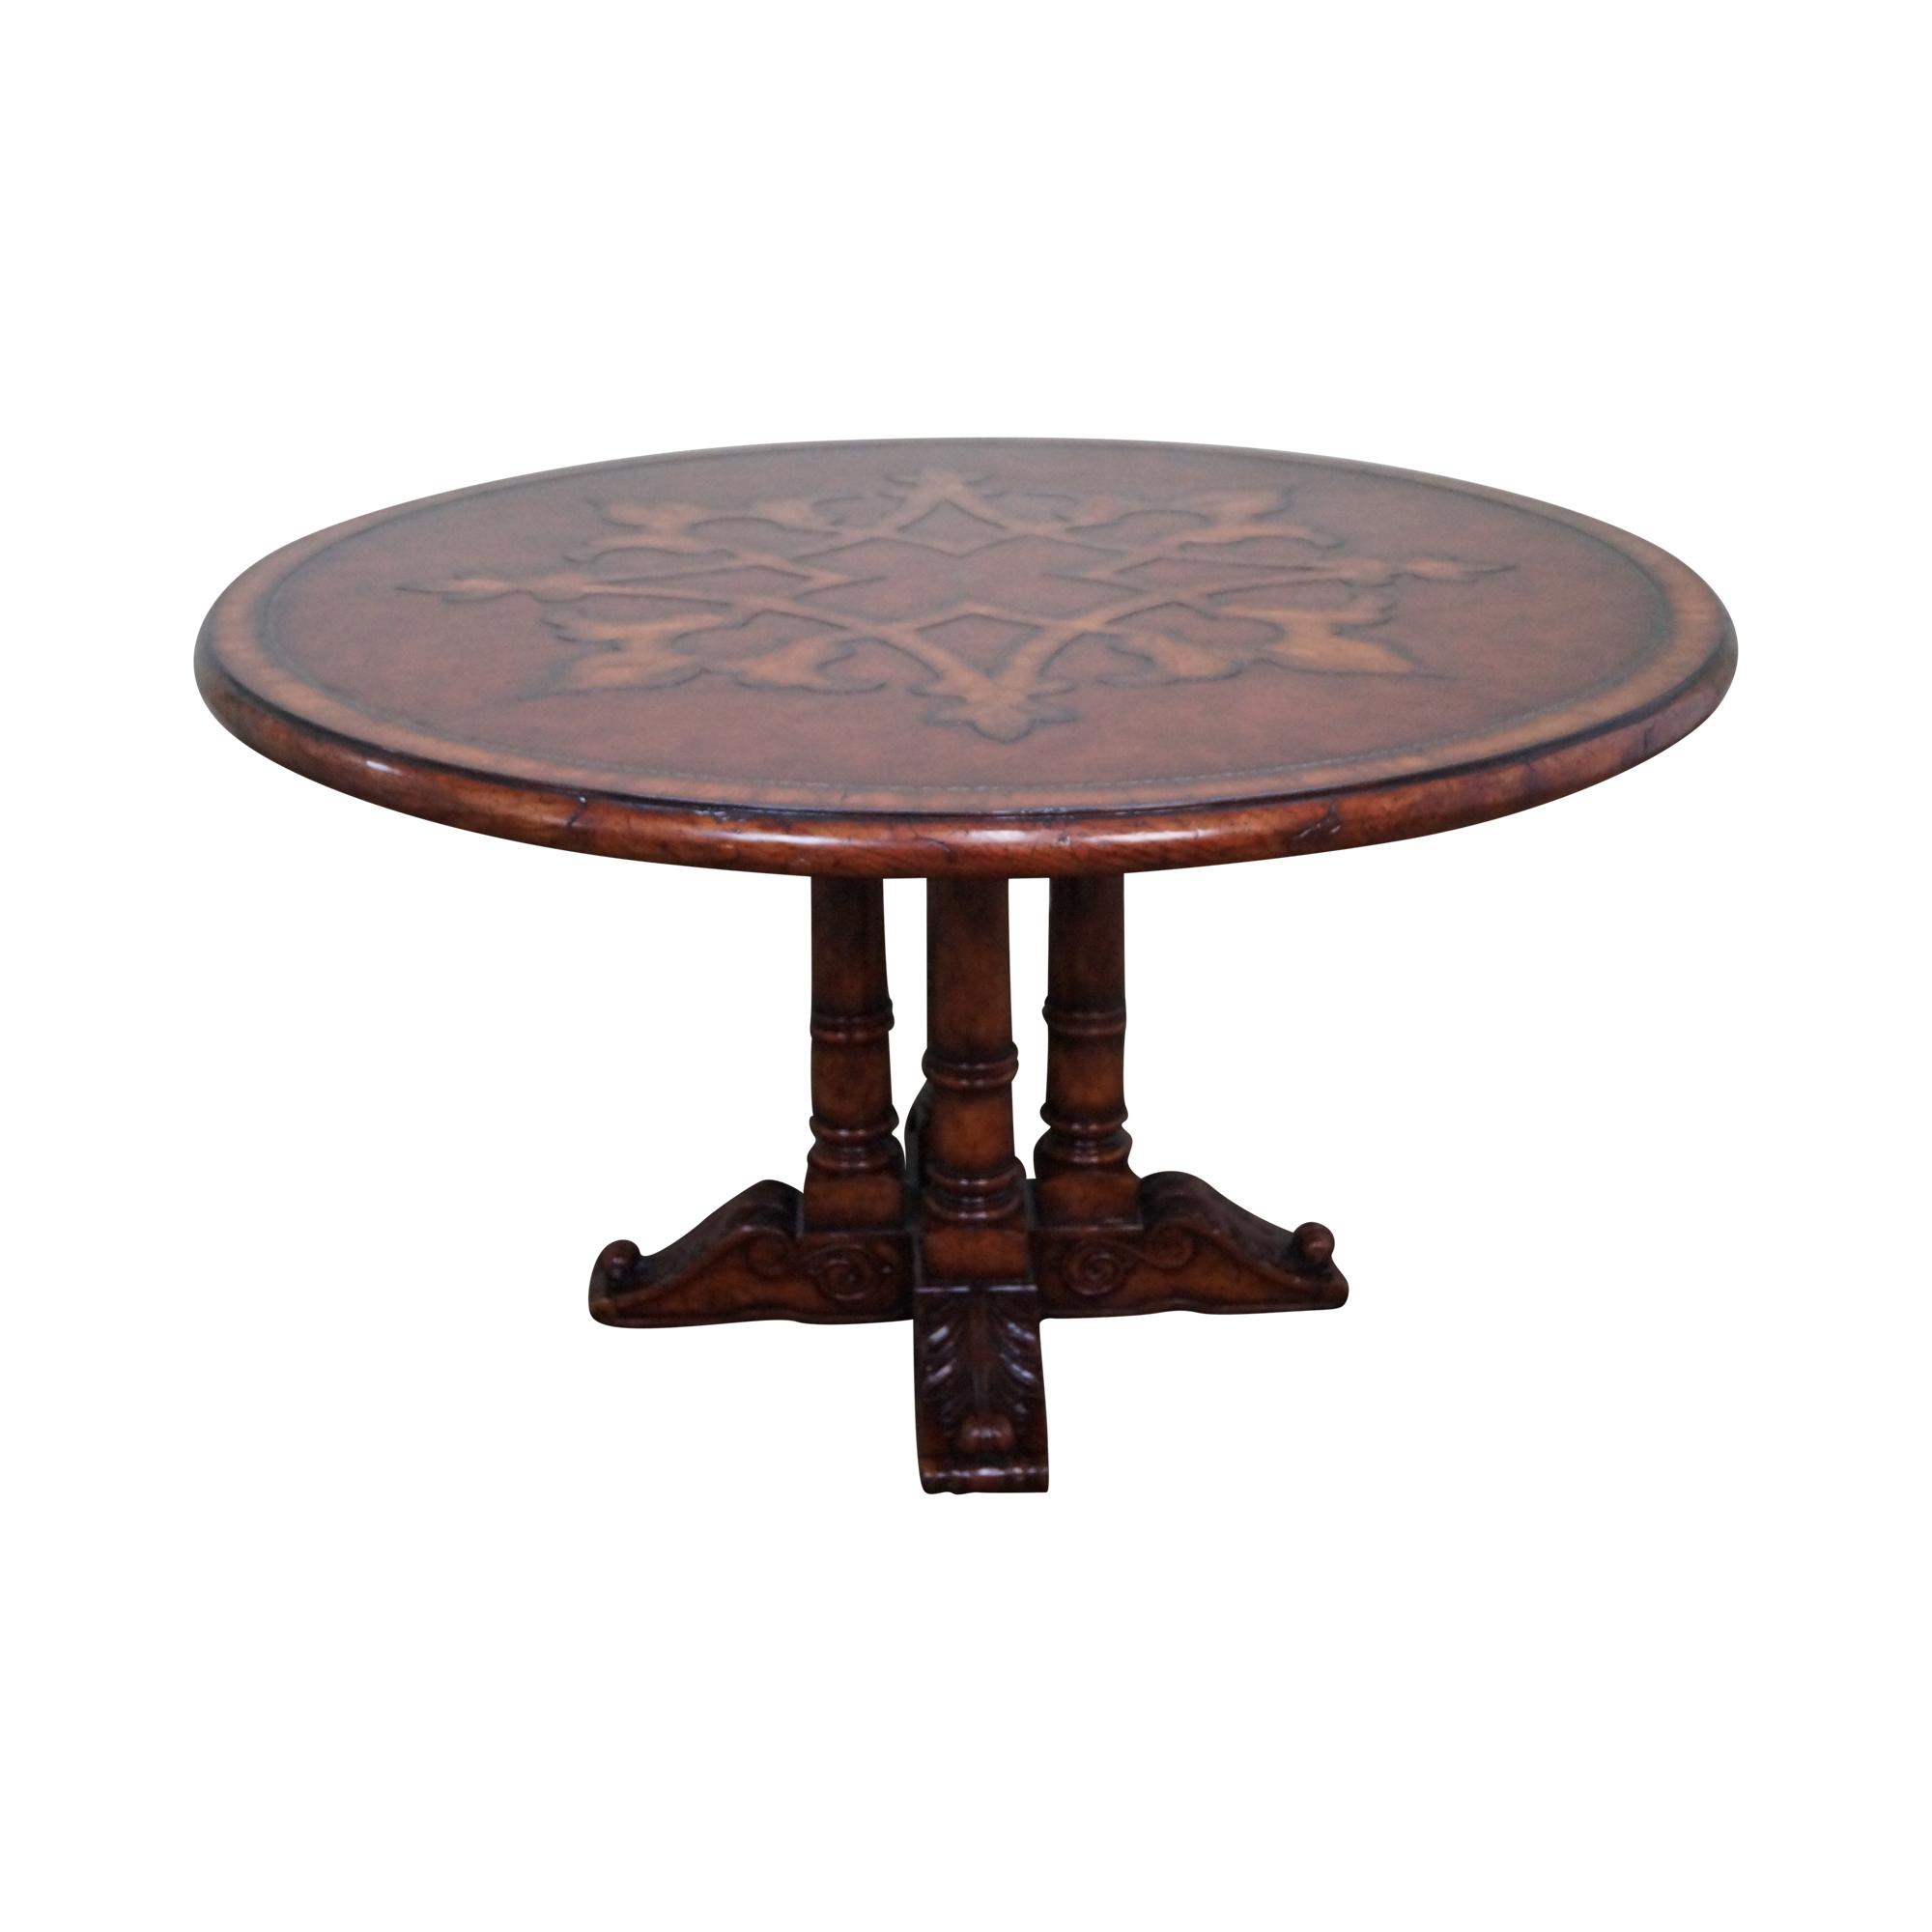 Theodore Alexander Pedestal Base Dining Table Chairish